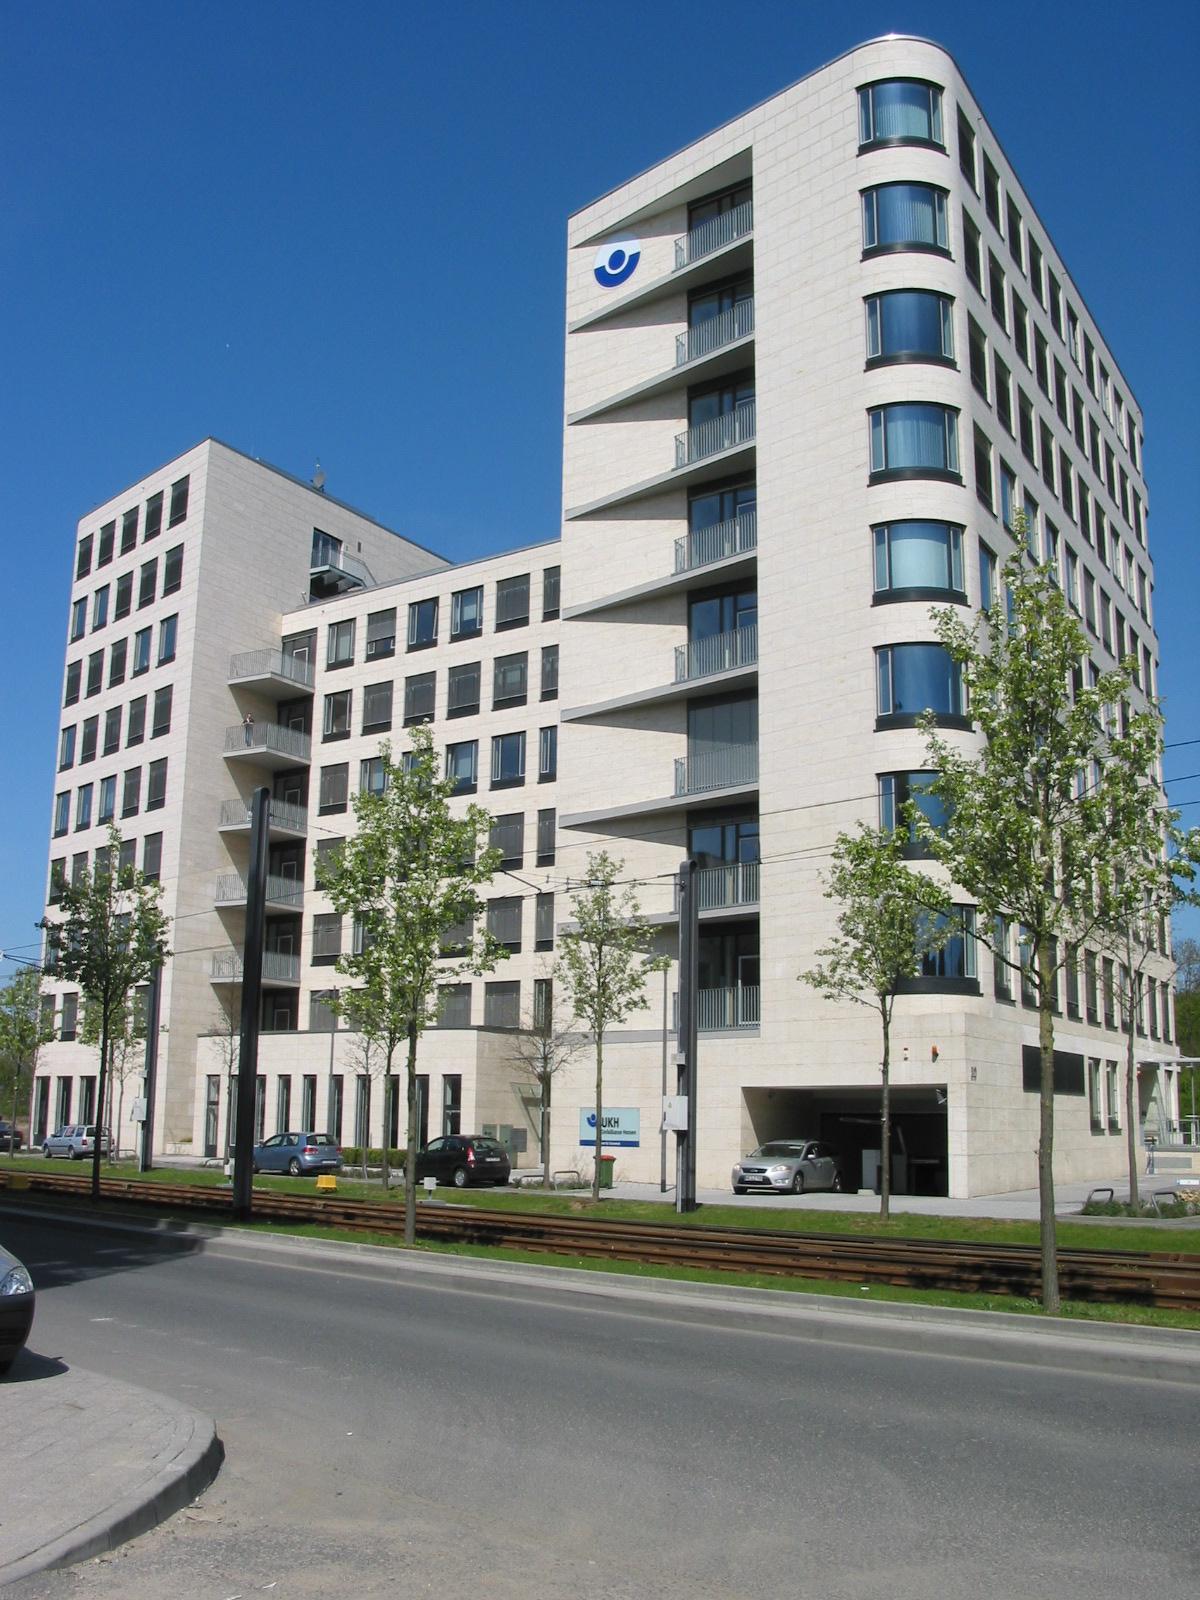 Unfallkasse Hessen; Frankfurt